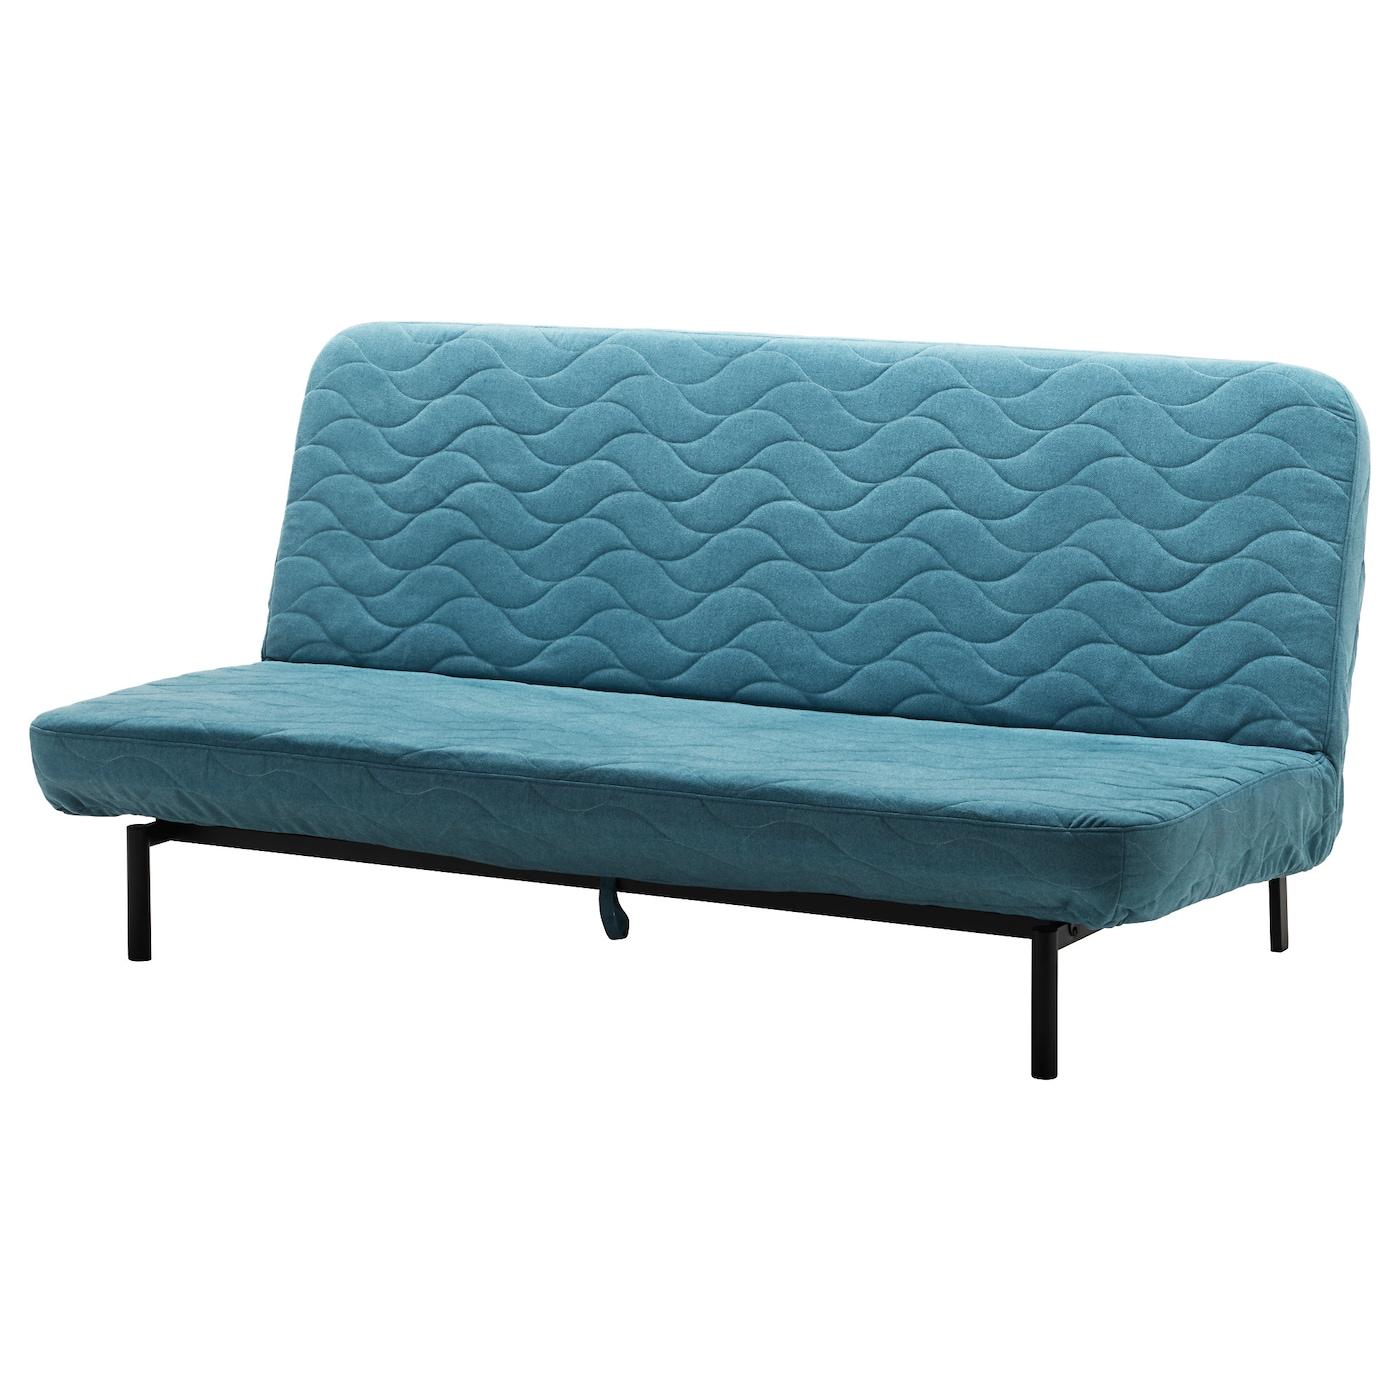 Ikea Nyhamn 3 Seat Sofa Bed